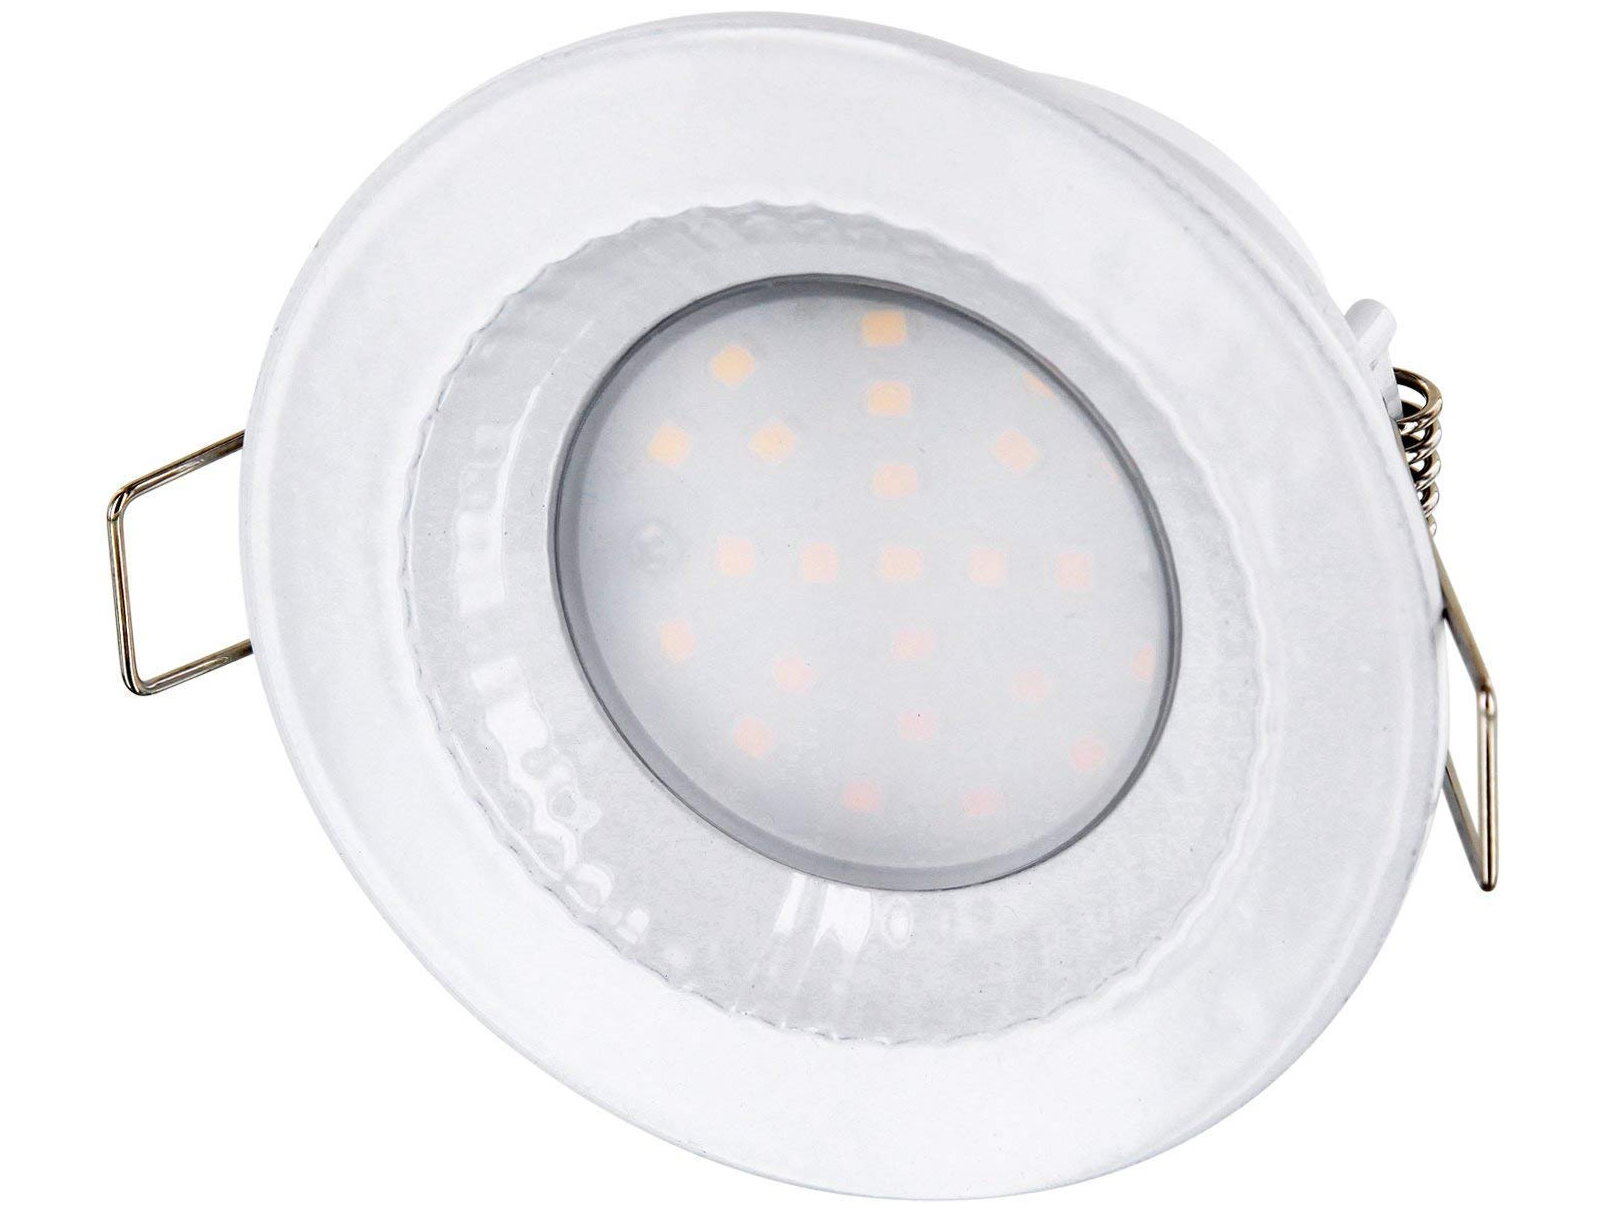 LED Einbaustrahler IP54 Druckguss weiß - 230V tagesweiß